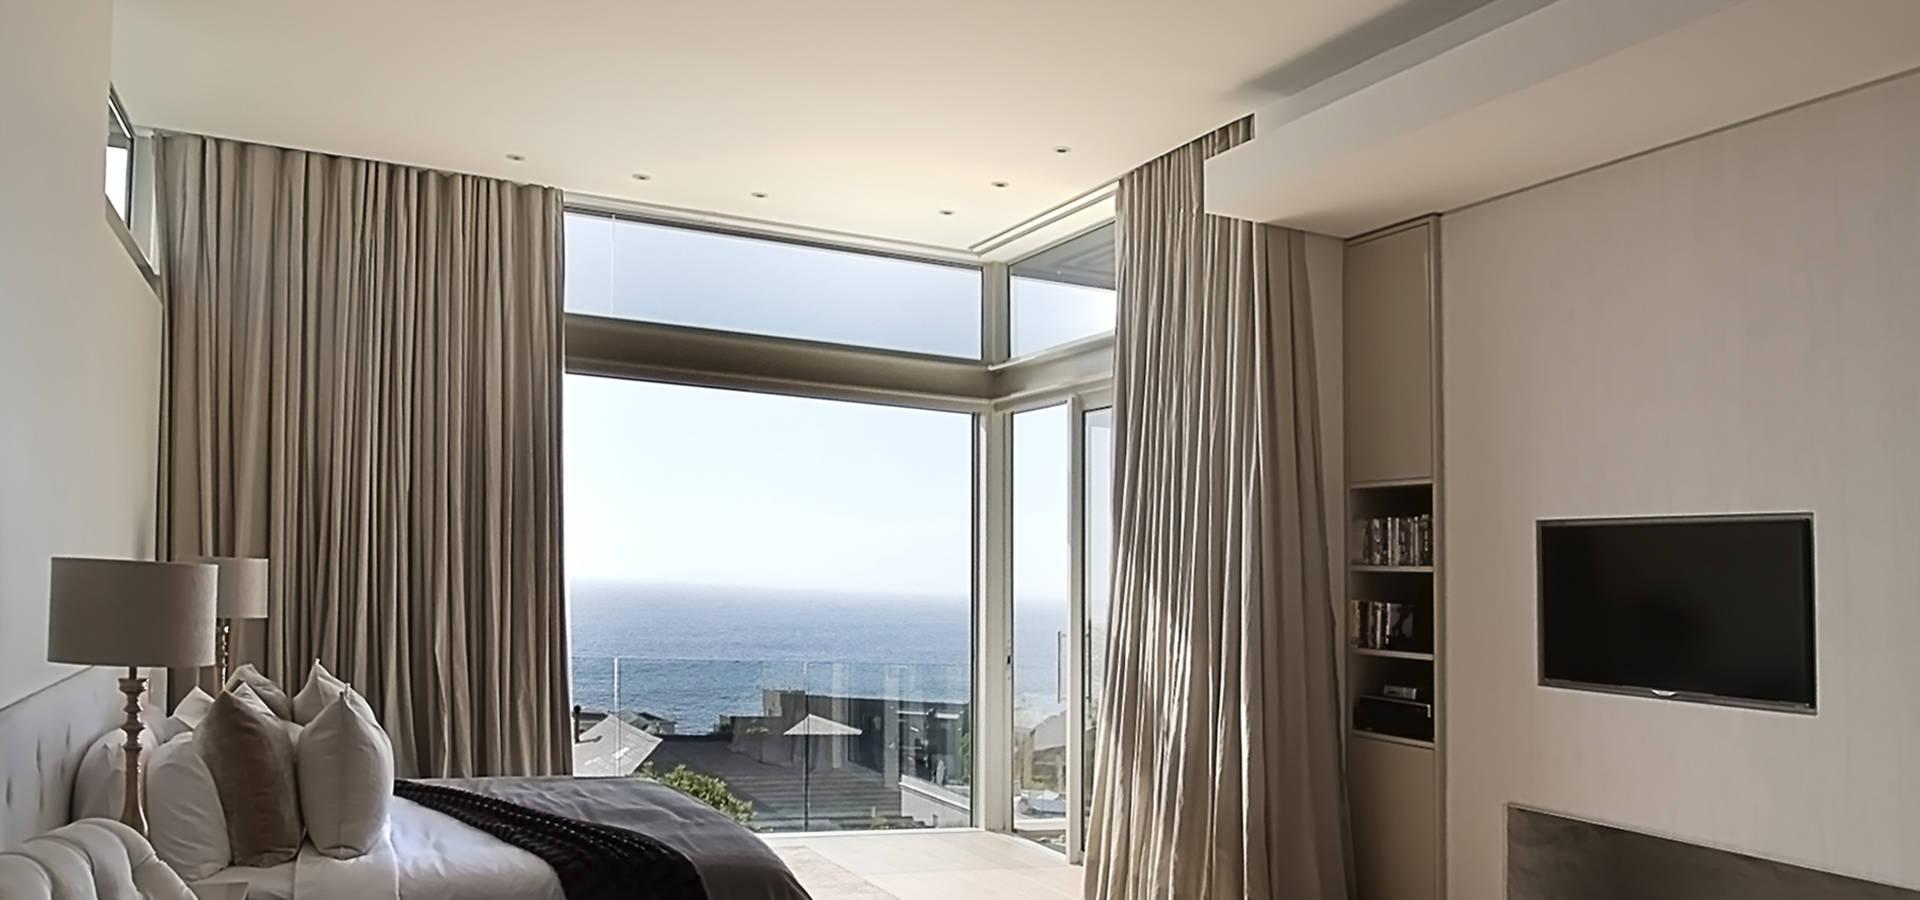 Make Architects + Interior Studio